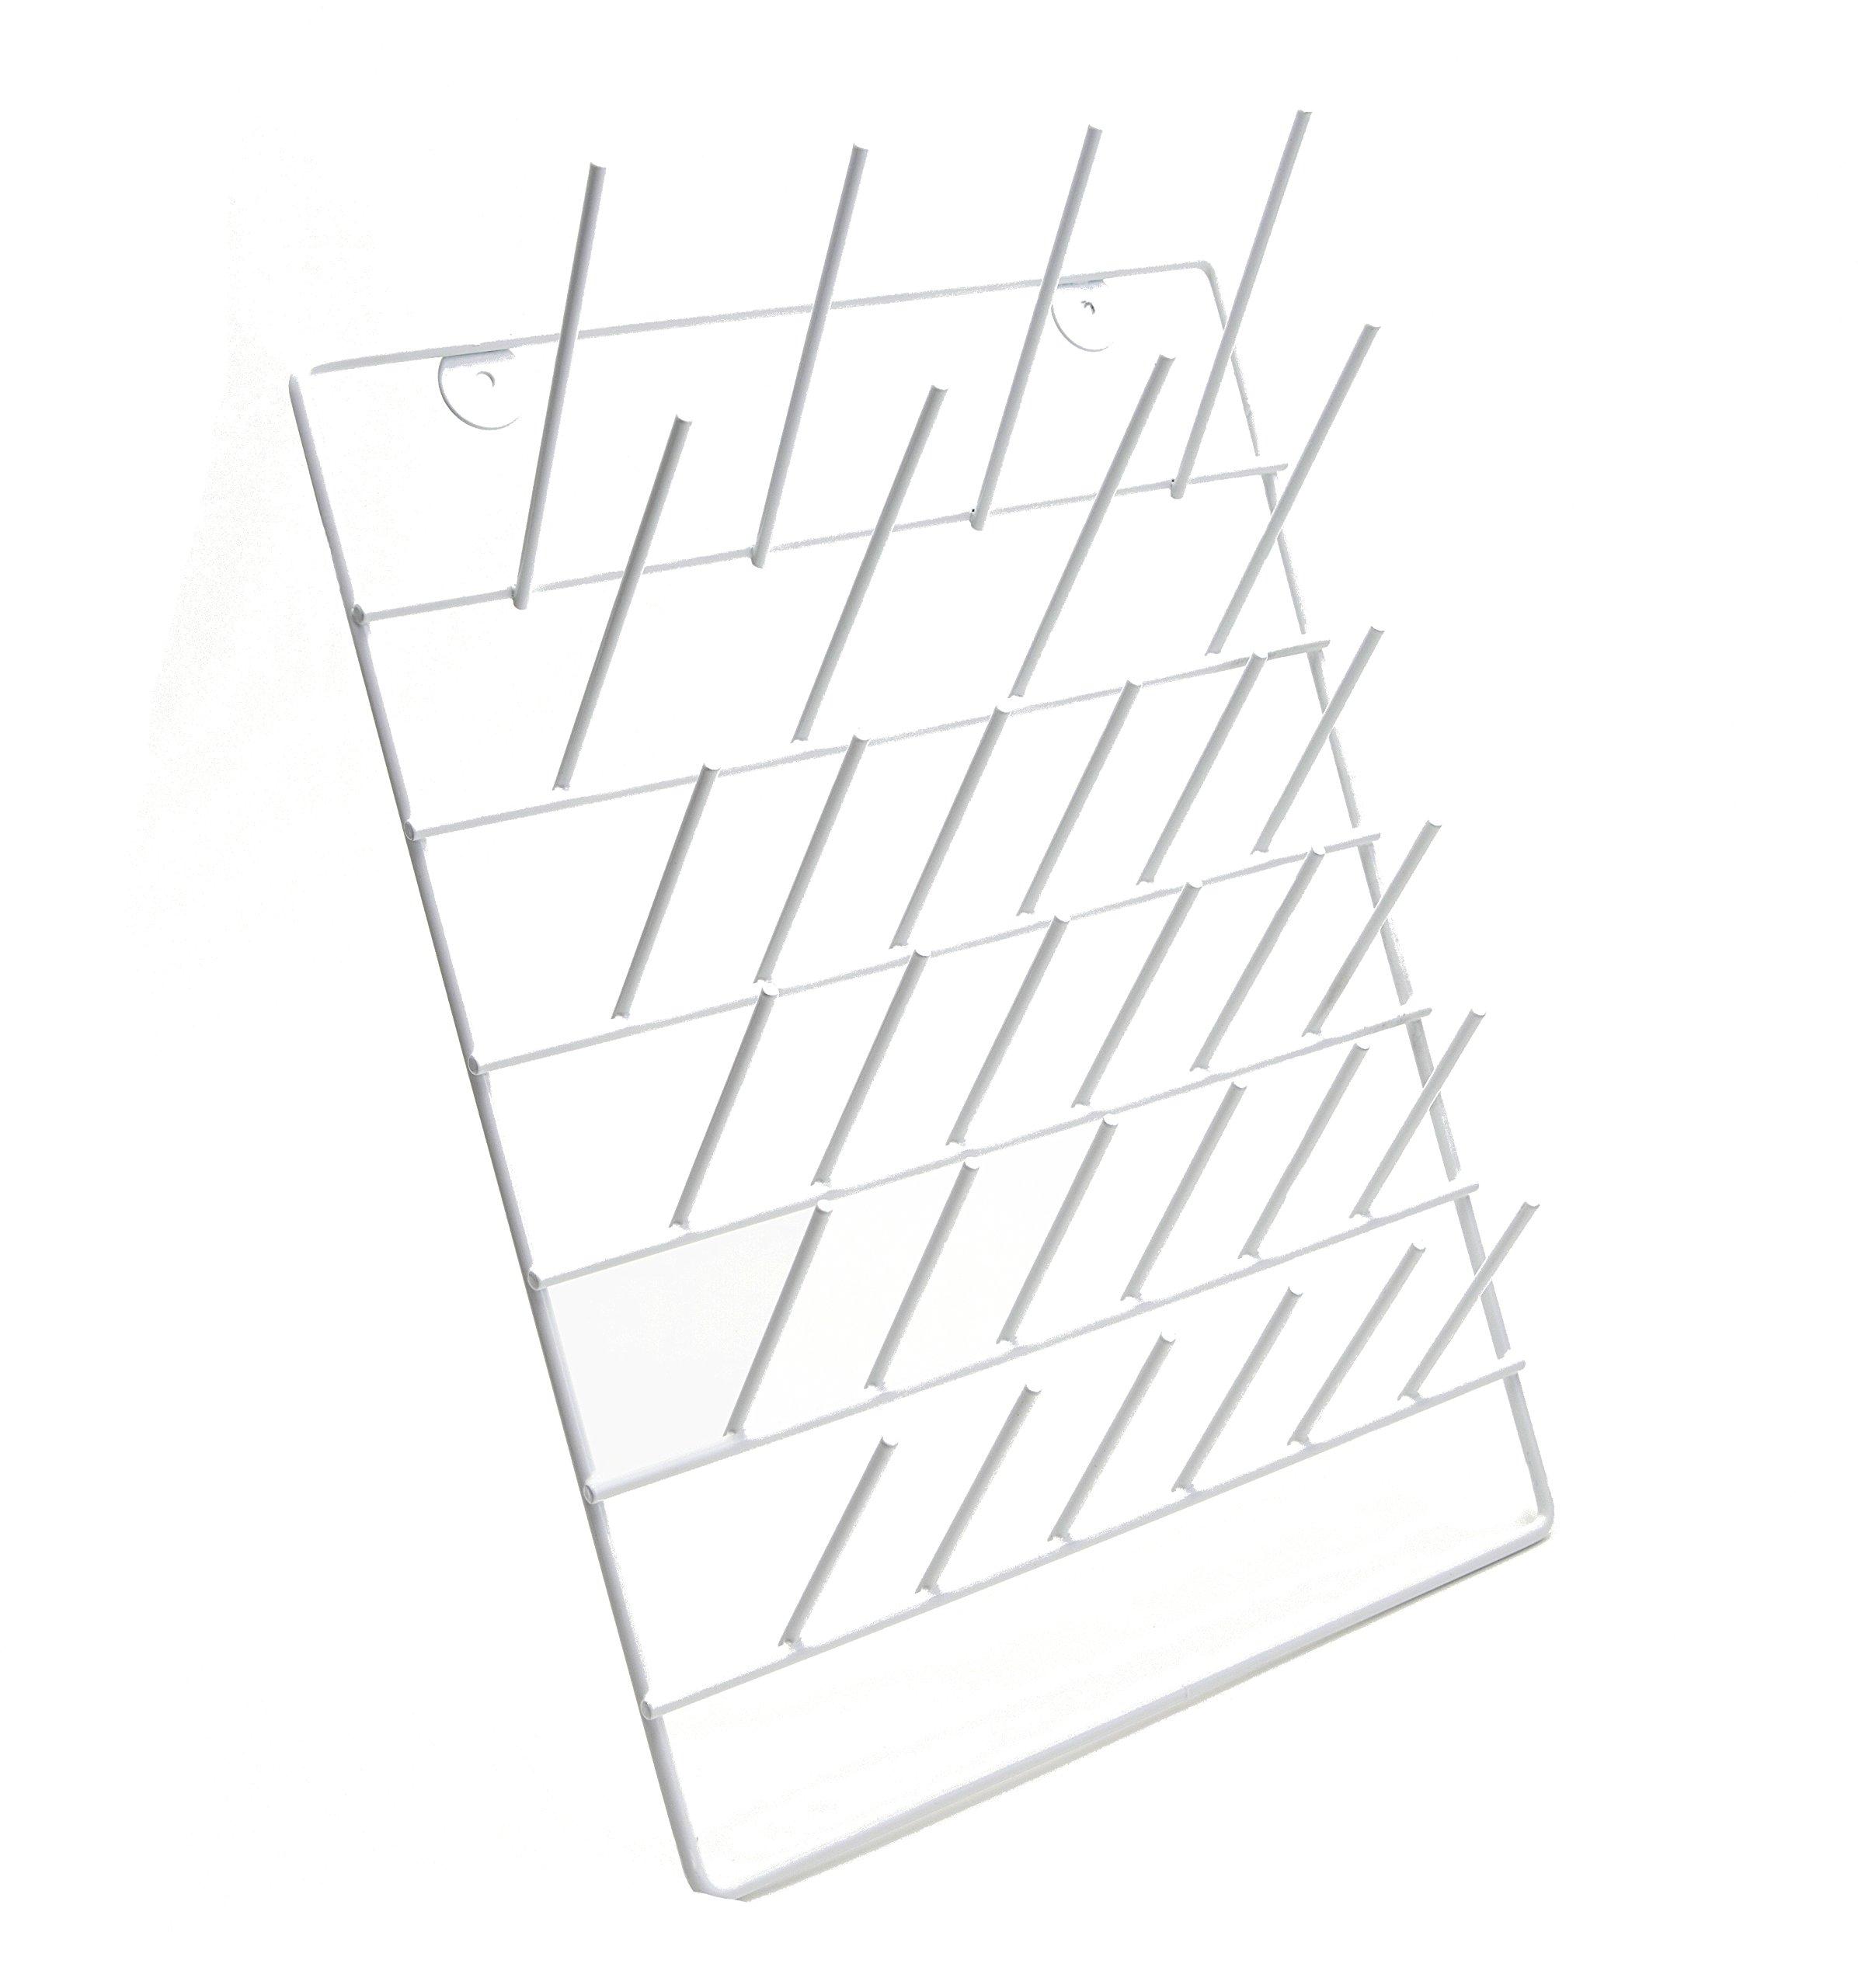 Dynalon 559165-0000 Epoxy-Coated Drying Rack, 12.25 x 4.187 x 15.75 in, Milliliters, Degree C, Epoxy-Coated Steel, White (